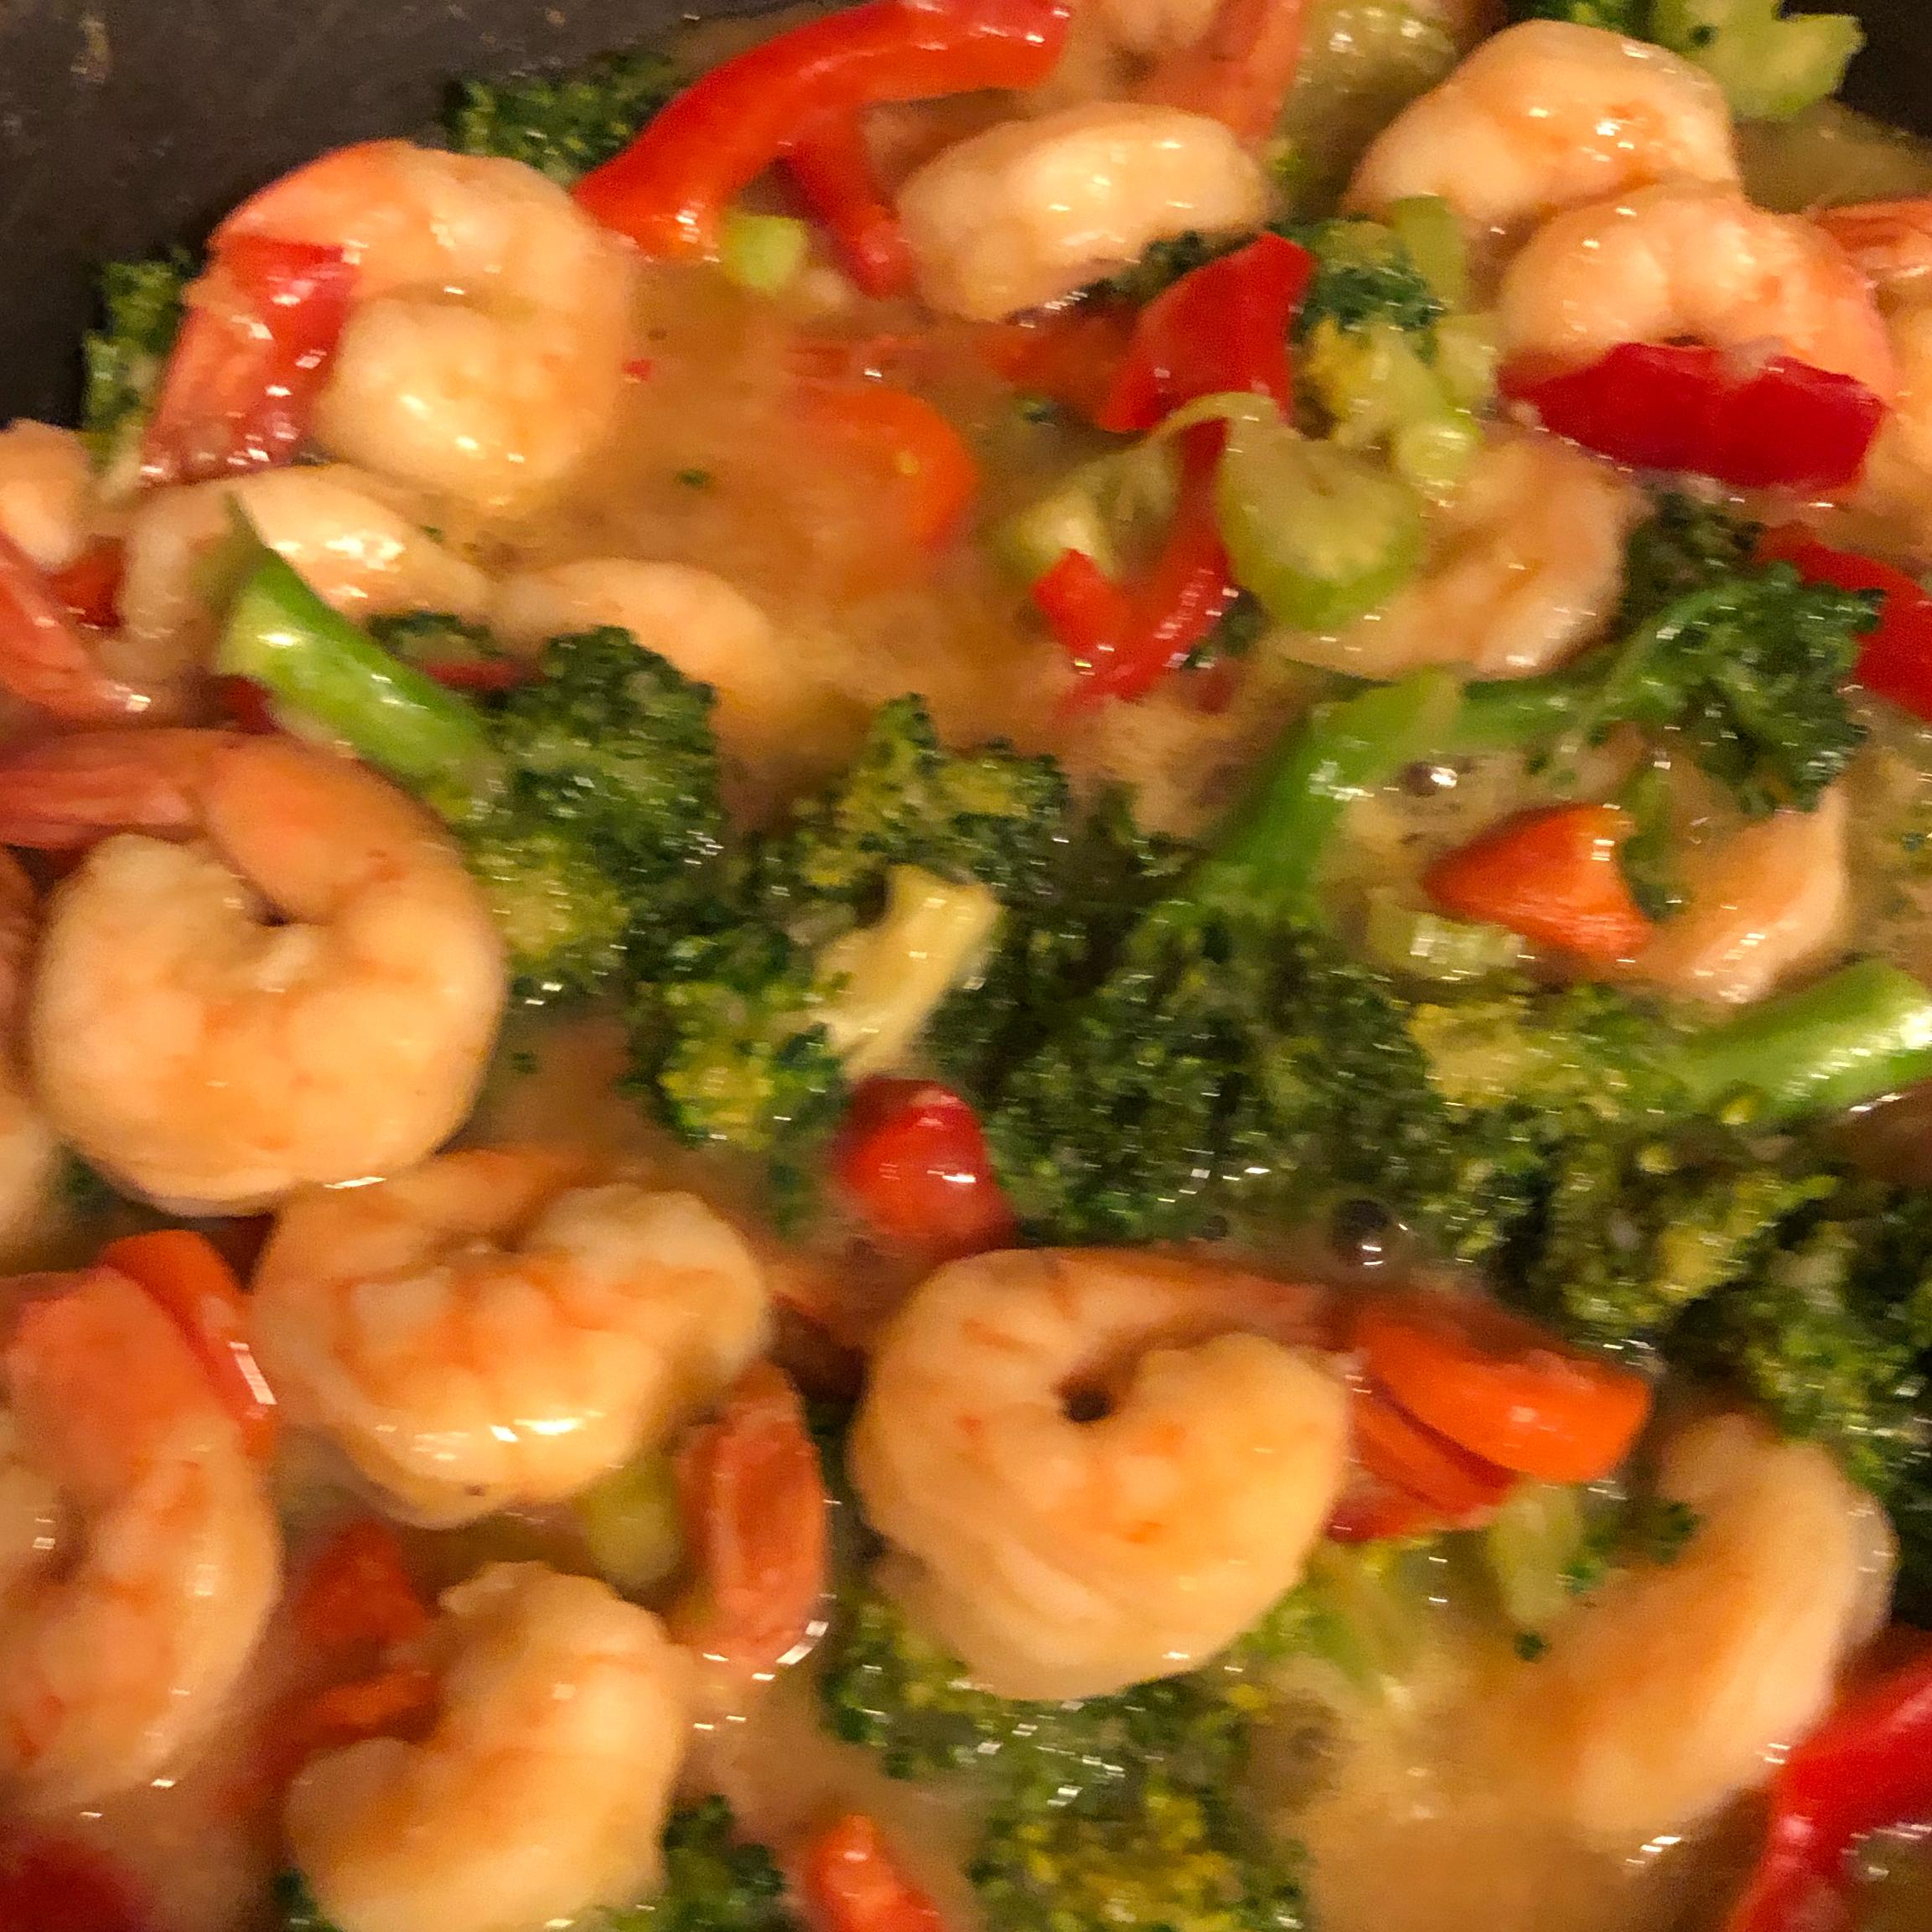 Shrimp with Broccoli in Garlic Sauce